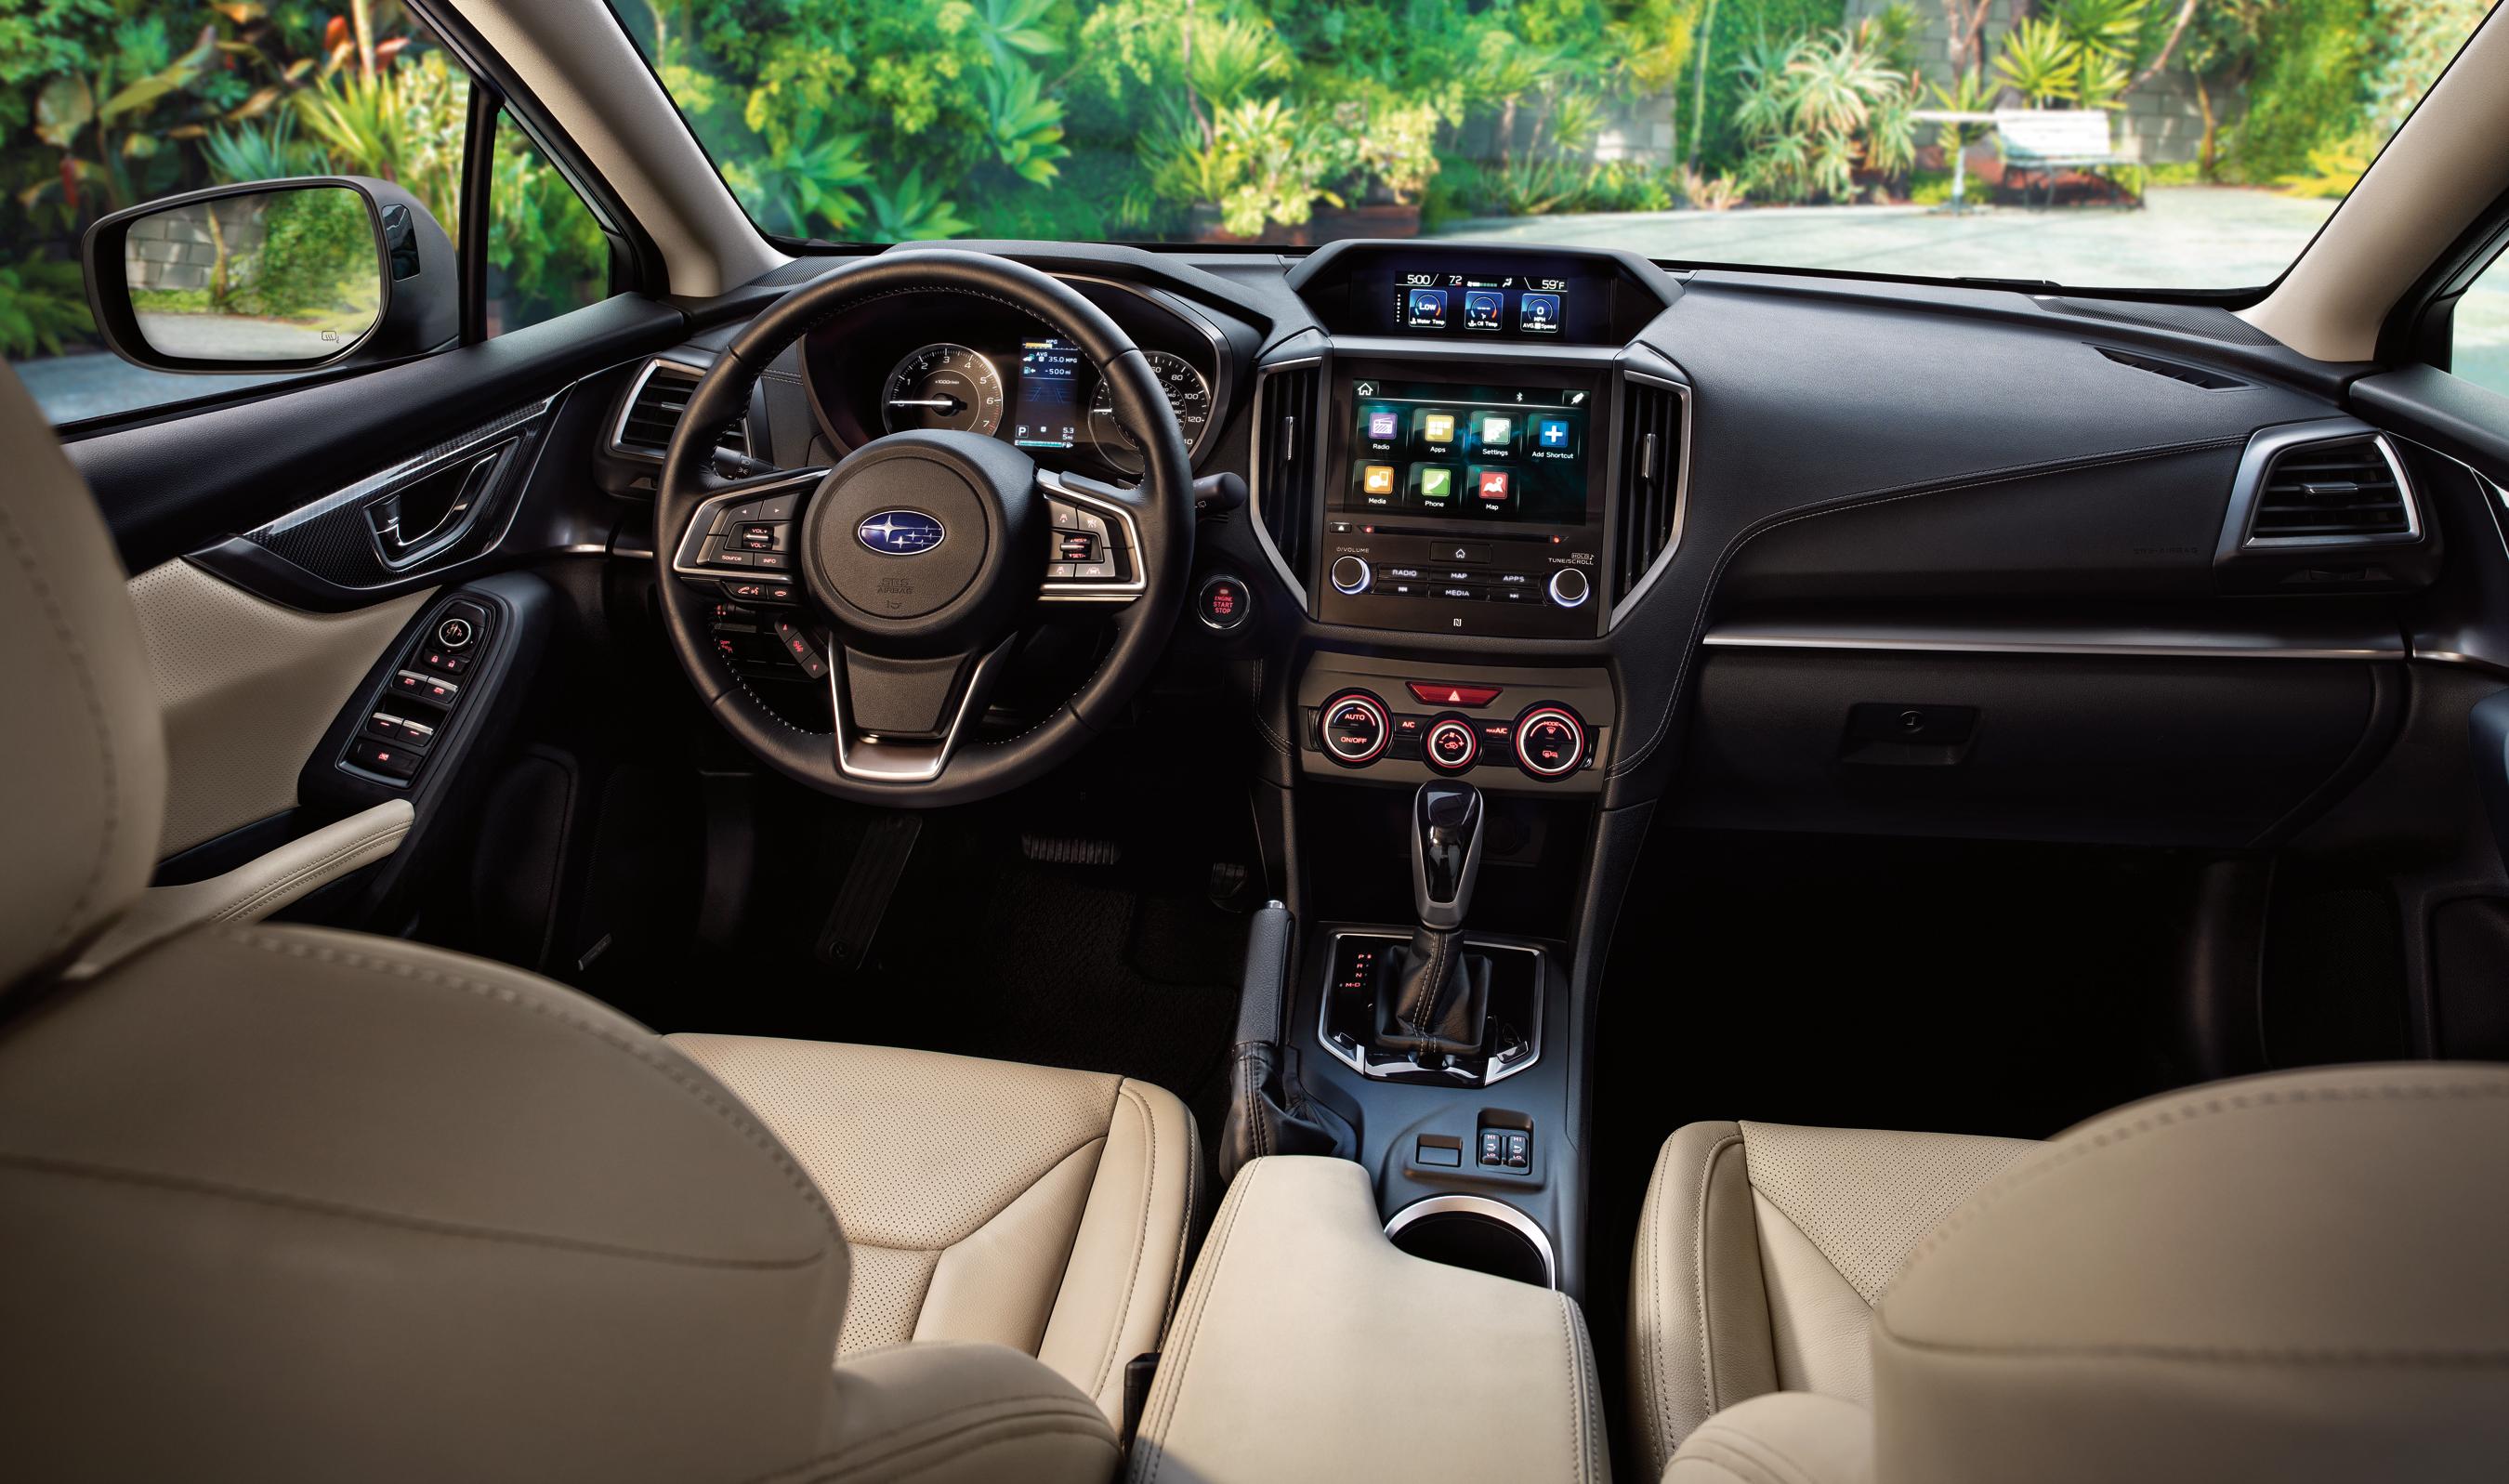 Интерьер Subaru Impreza признан лучшим по мнению экспертов WardsAuto